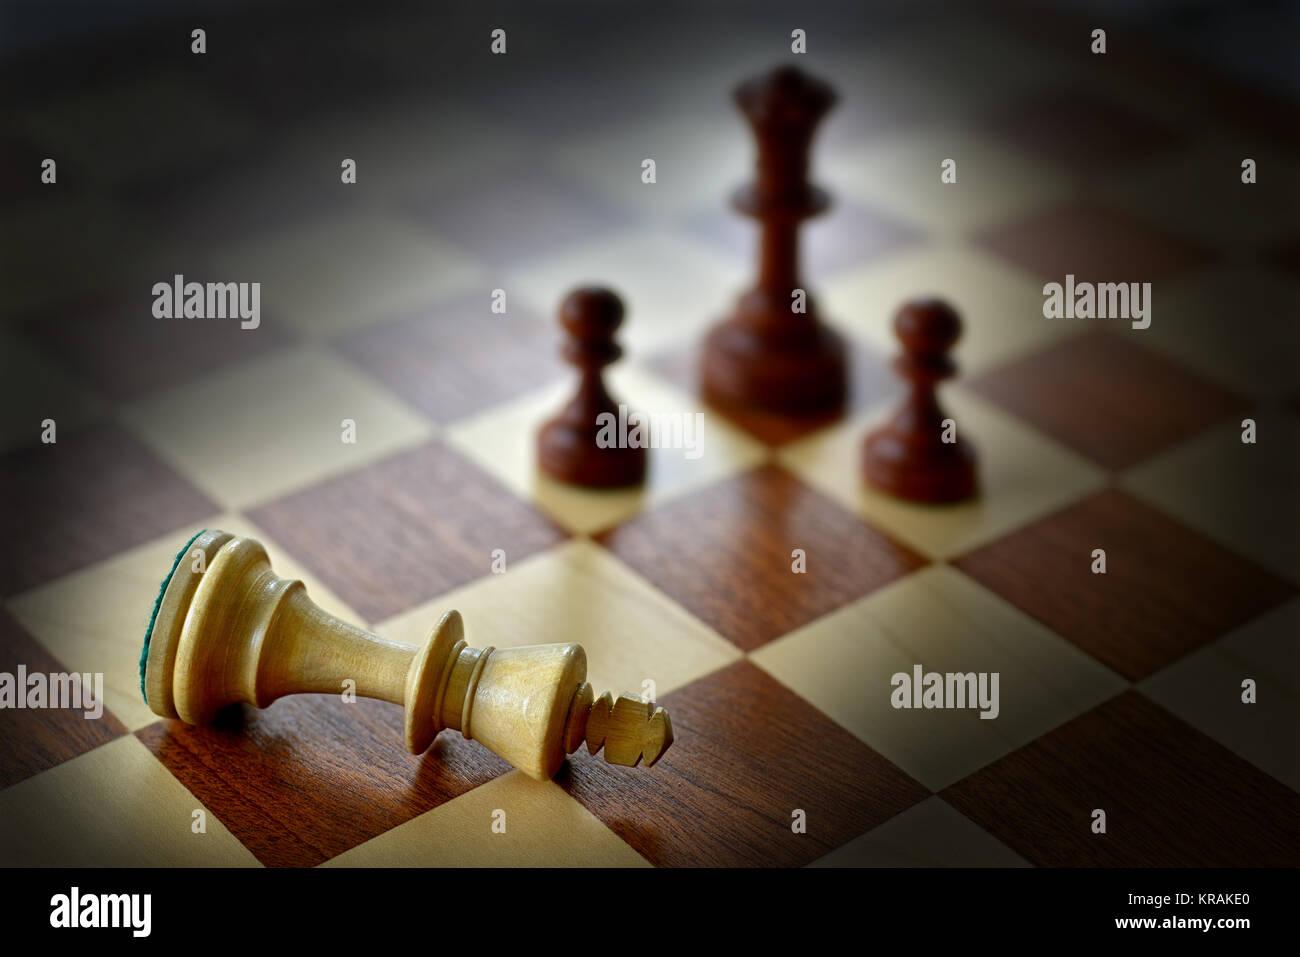 defeat - Stock Image